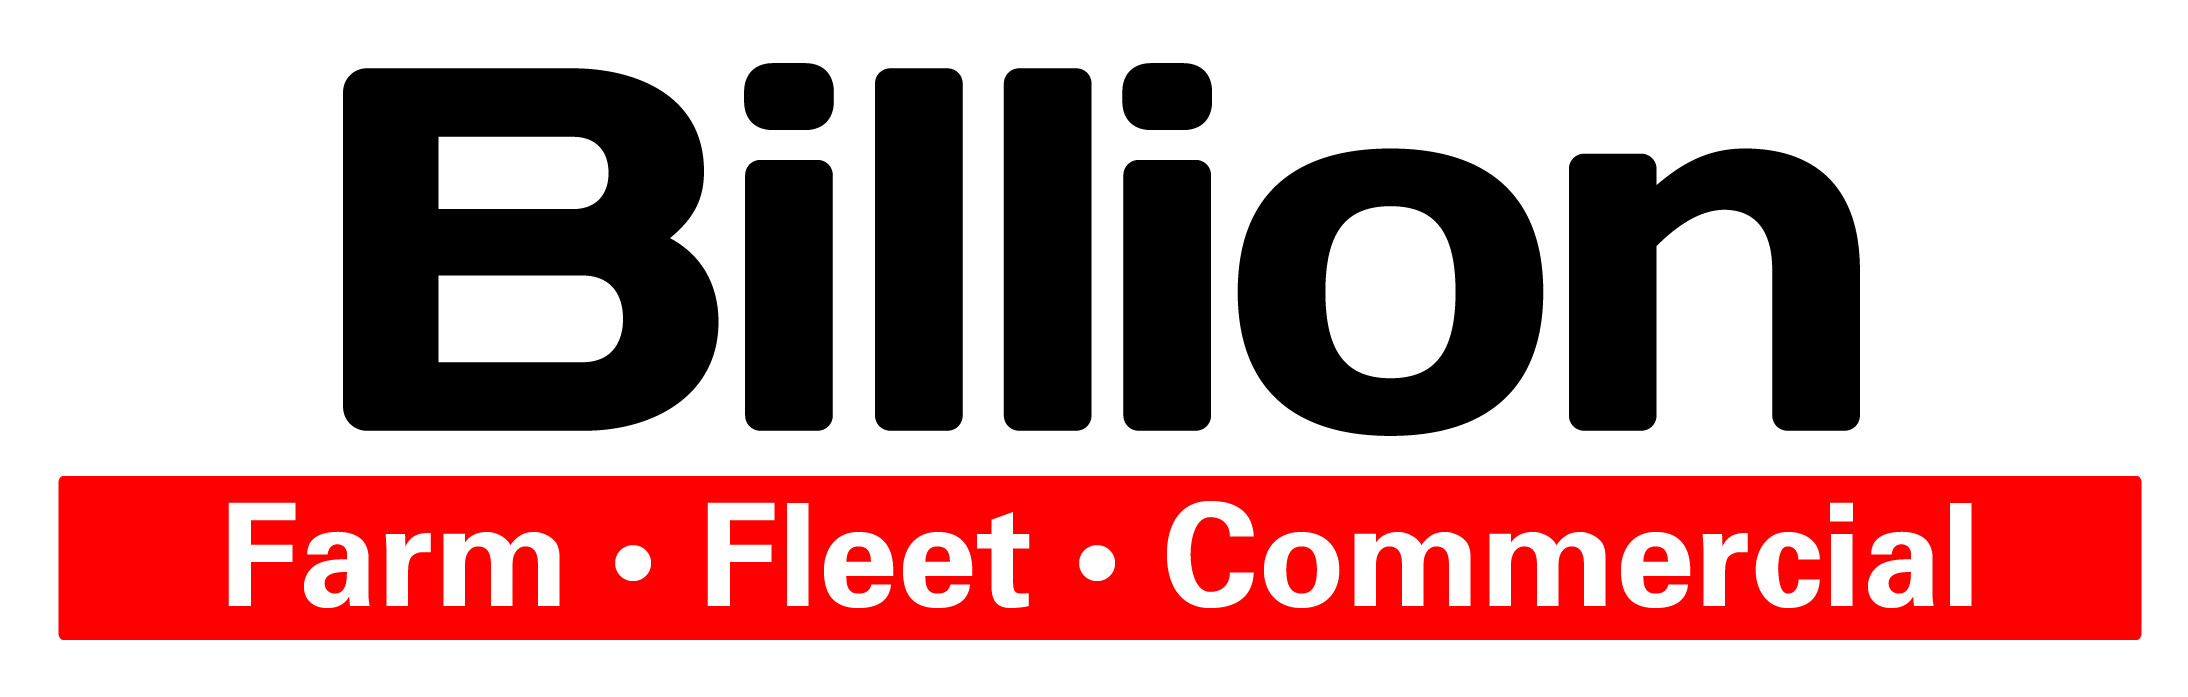 BillionAuto_Farm Fleet Commercial Logo-01